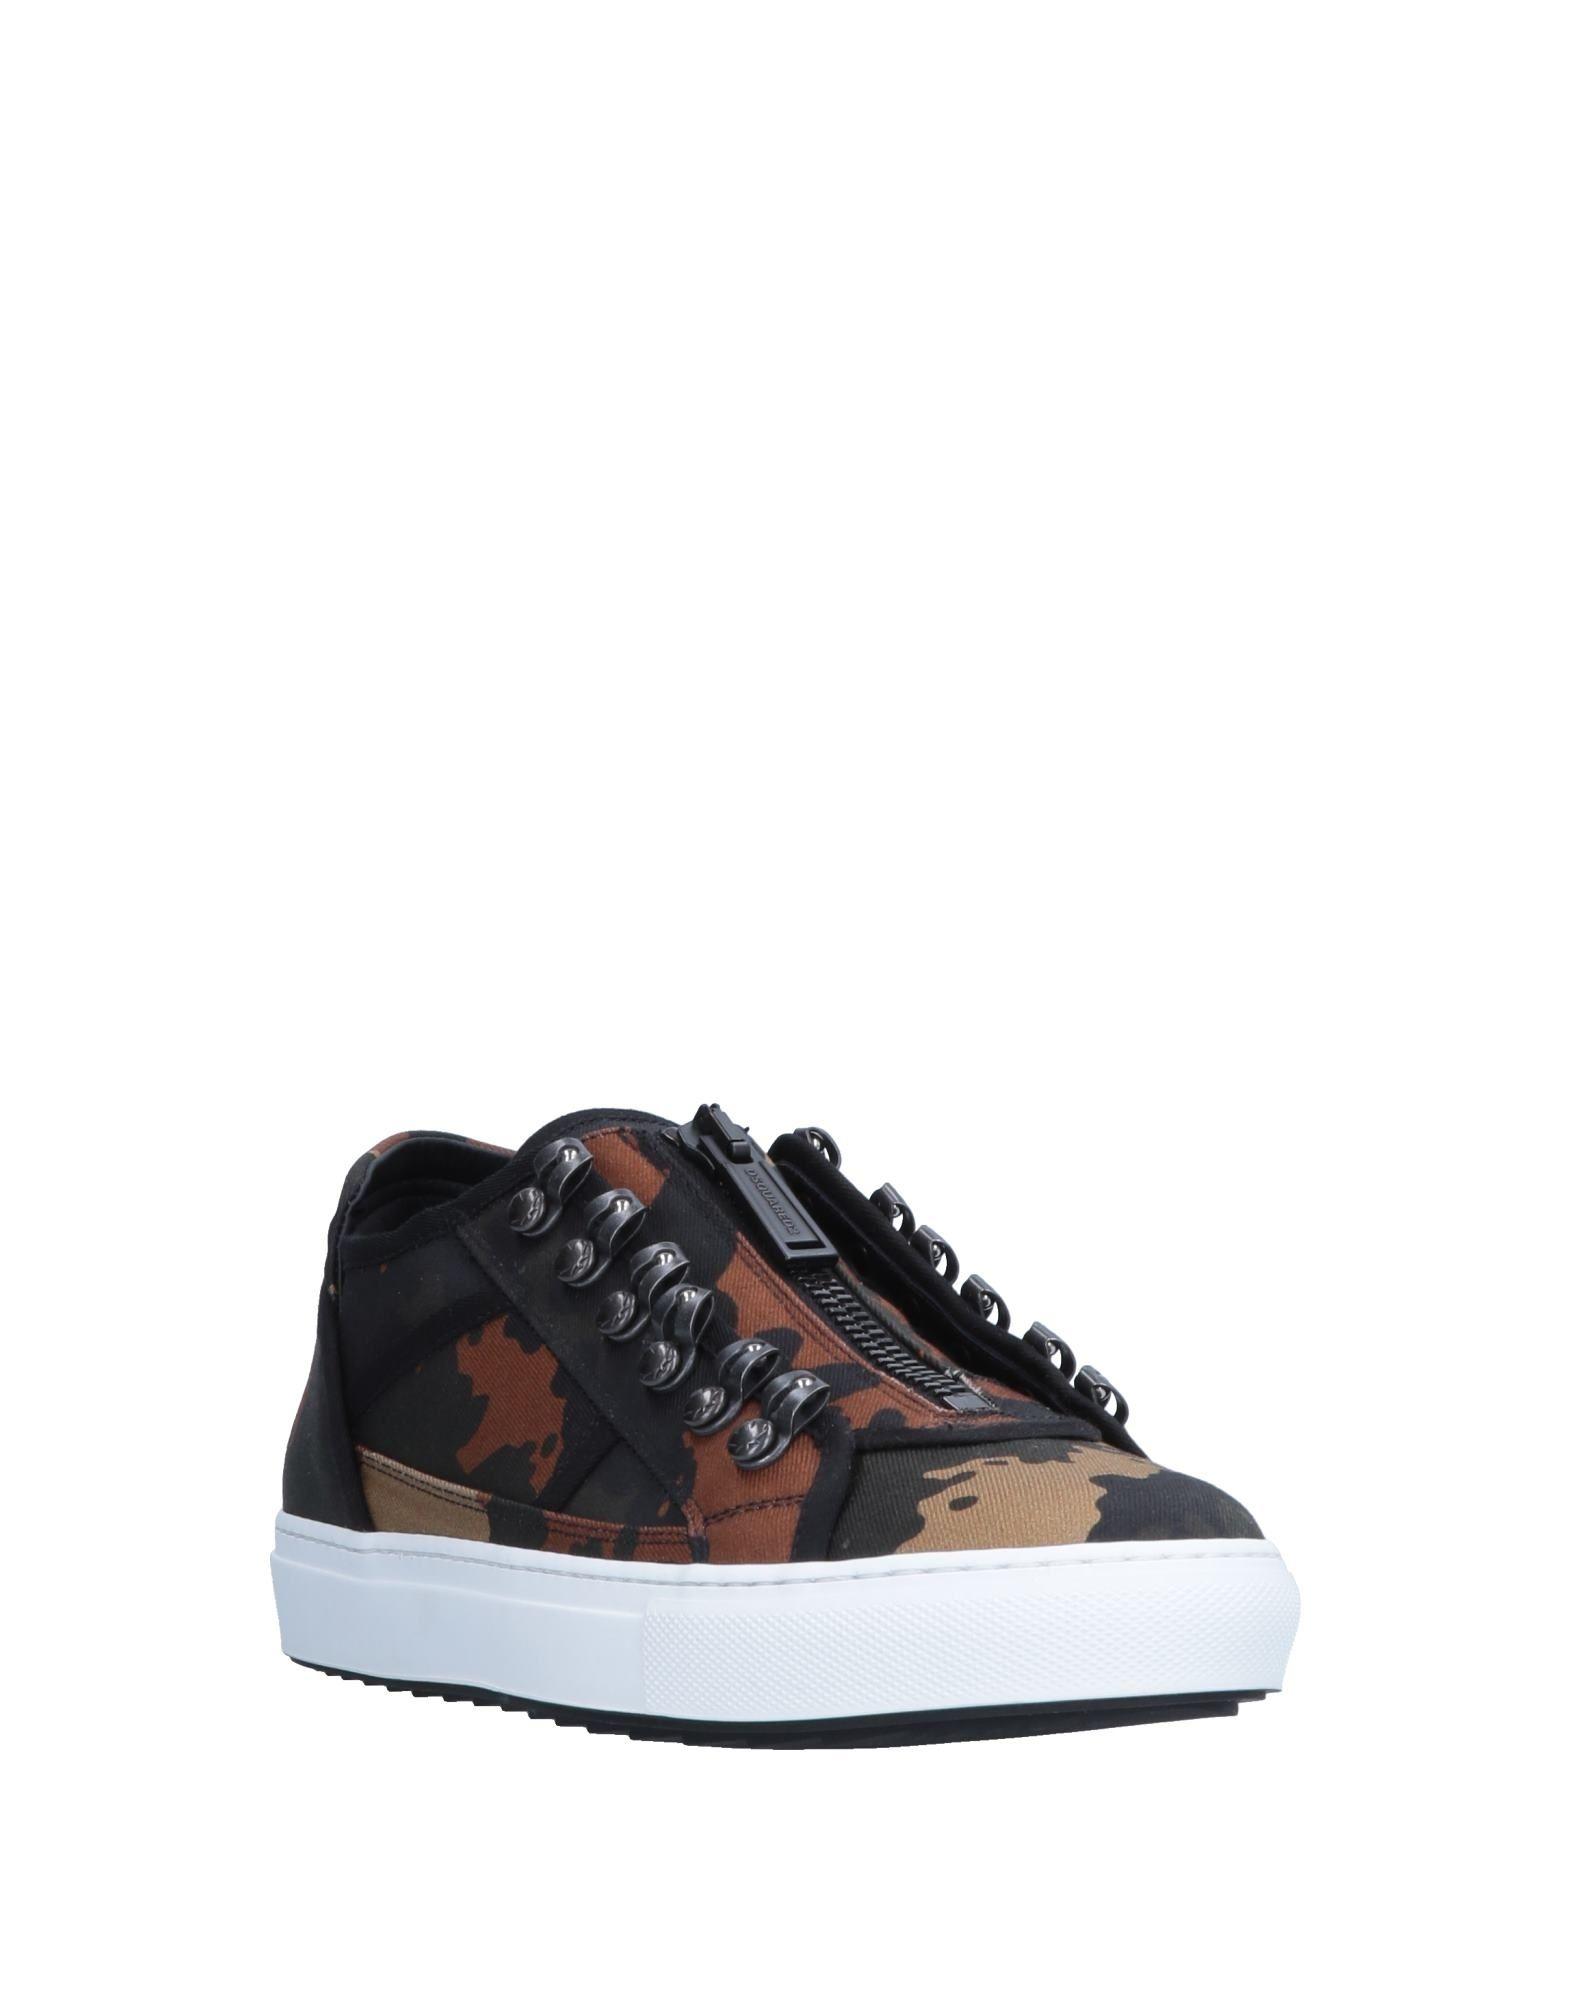 Dsquared2 Gute Sneakers Herren  11558871XH Gute Dsquared2 Qualität beliebte Schuhe b0c022